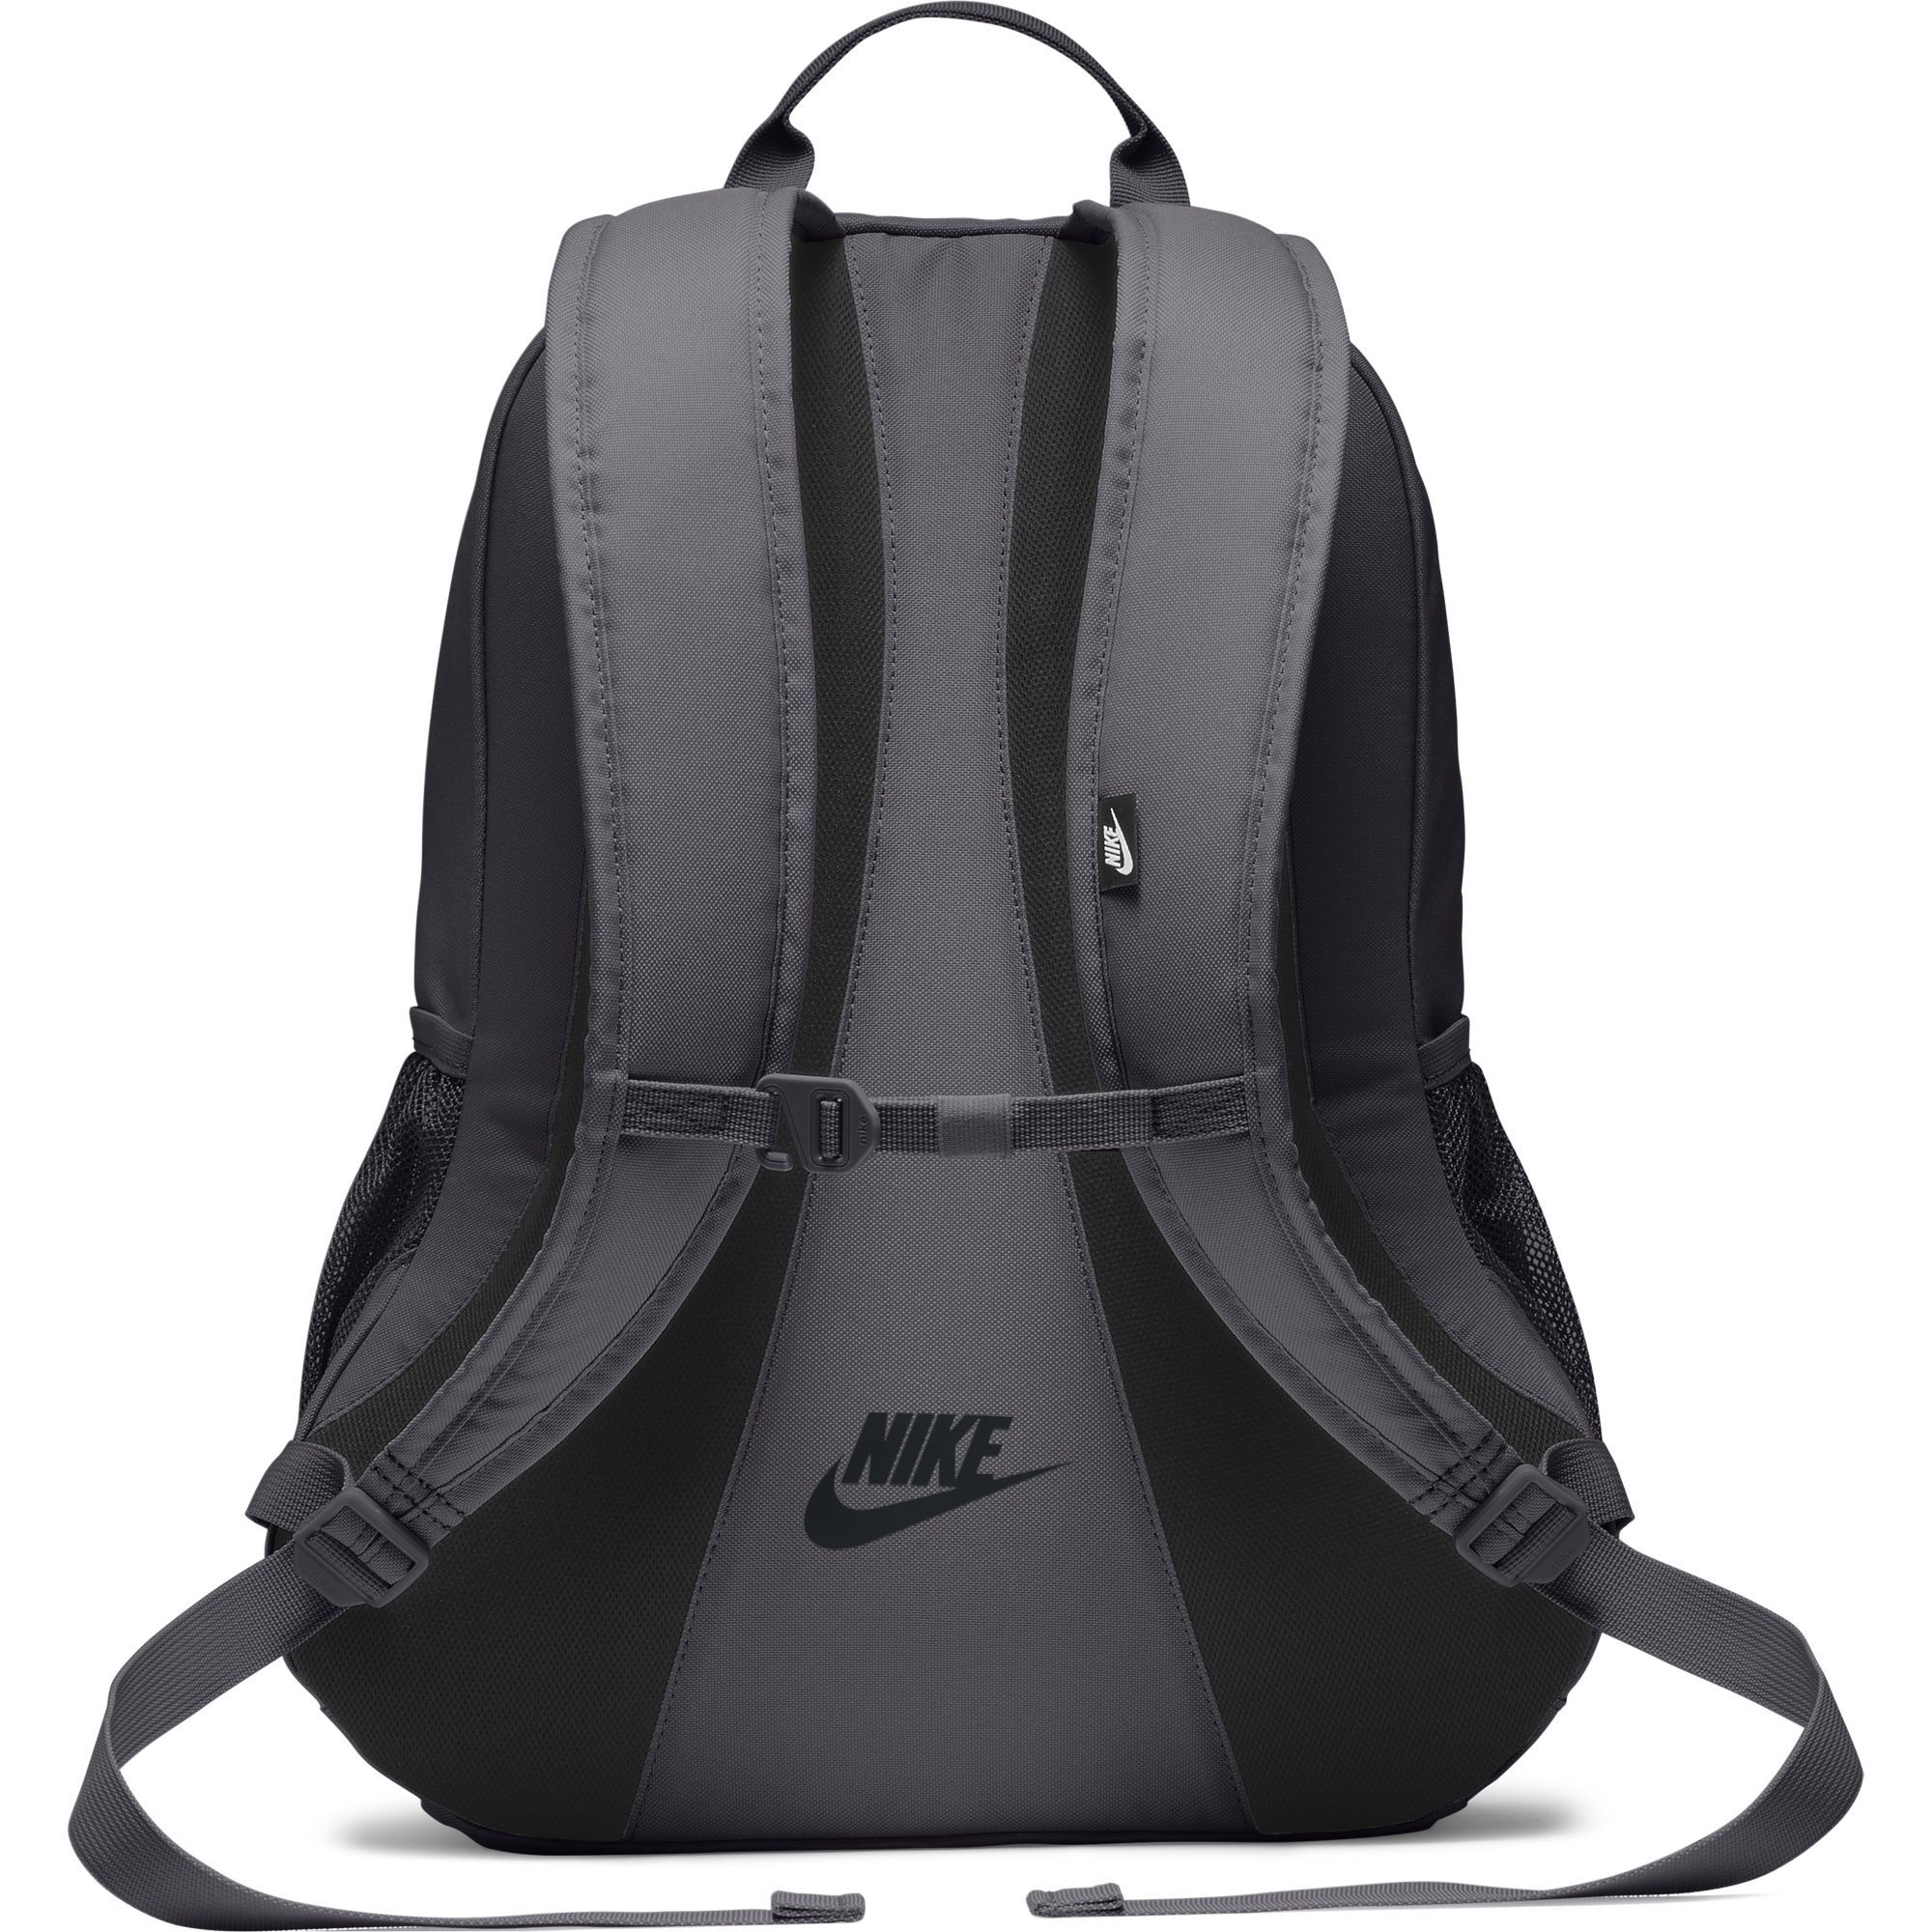 6aef2509e18ee ... plecak Nike Sportswear Hayward Futura 2.0 Backpack BA5217 021 ...